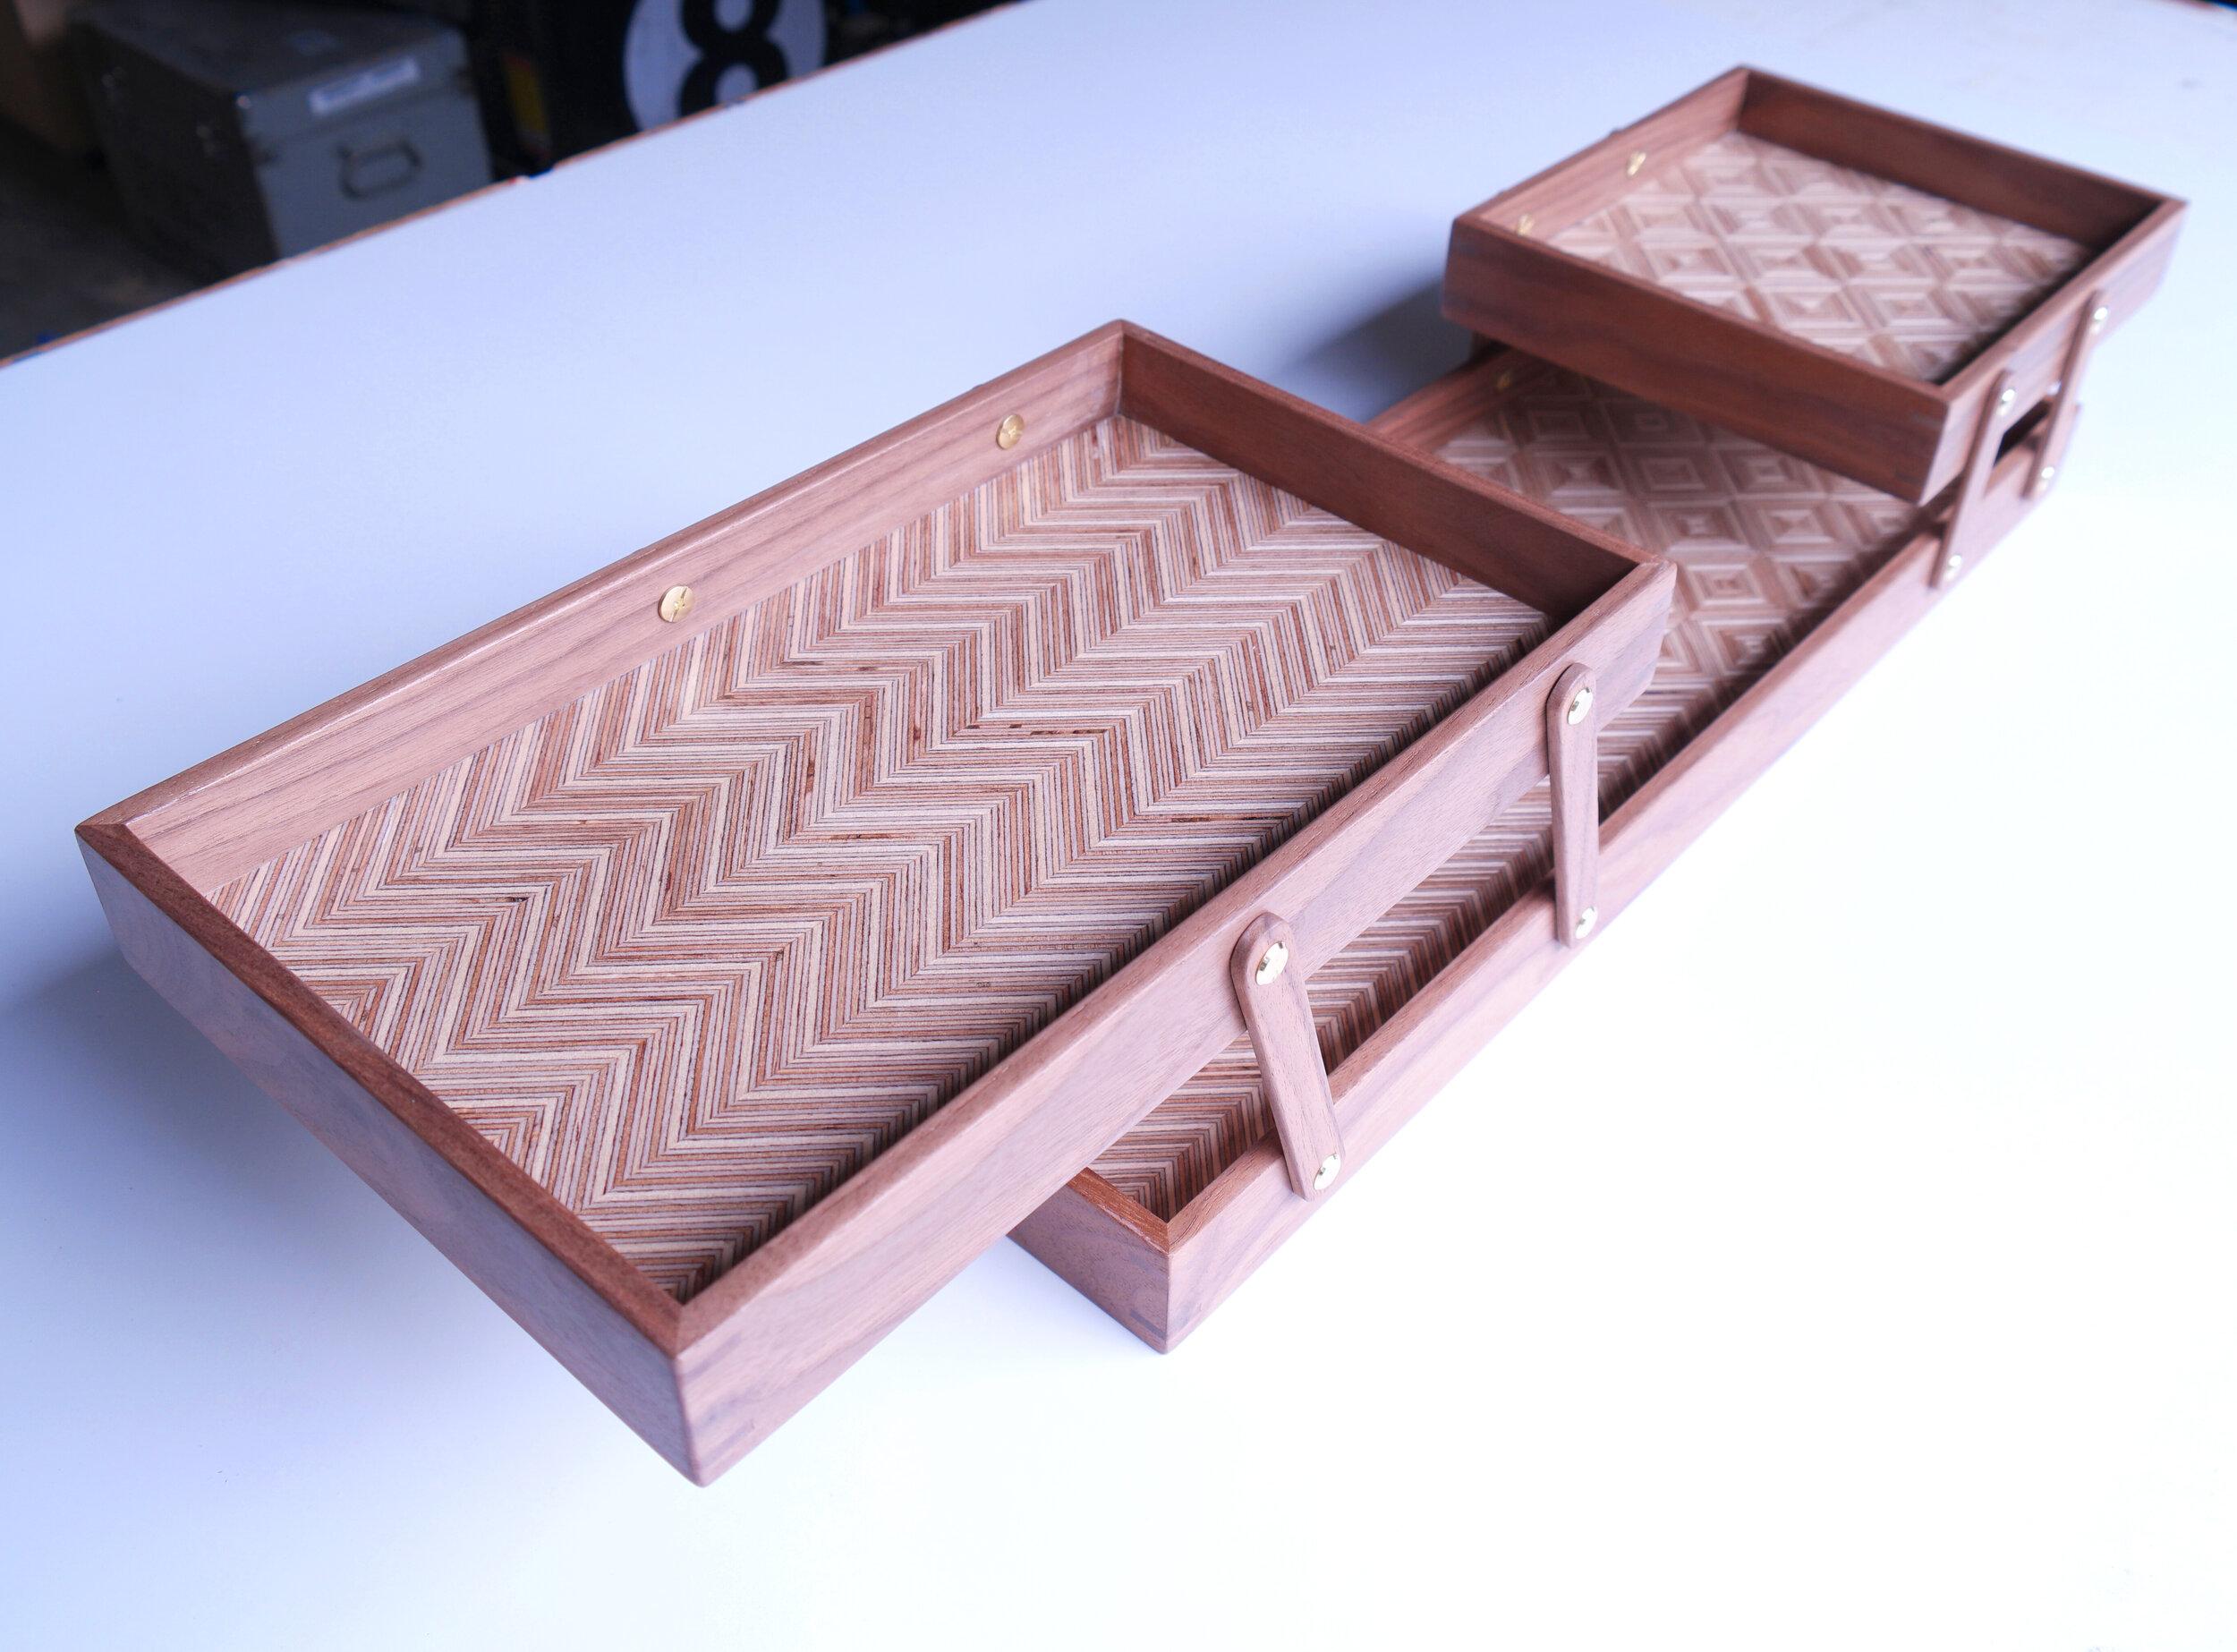 Folding Tray - https://www.ebay.com/itm/333336243428